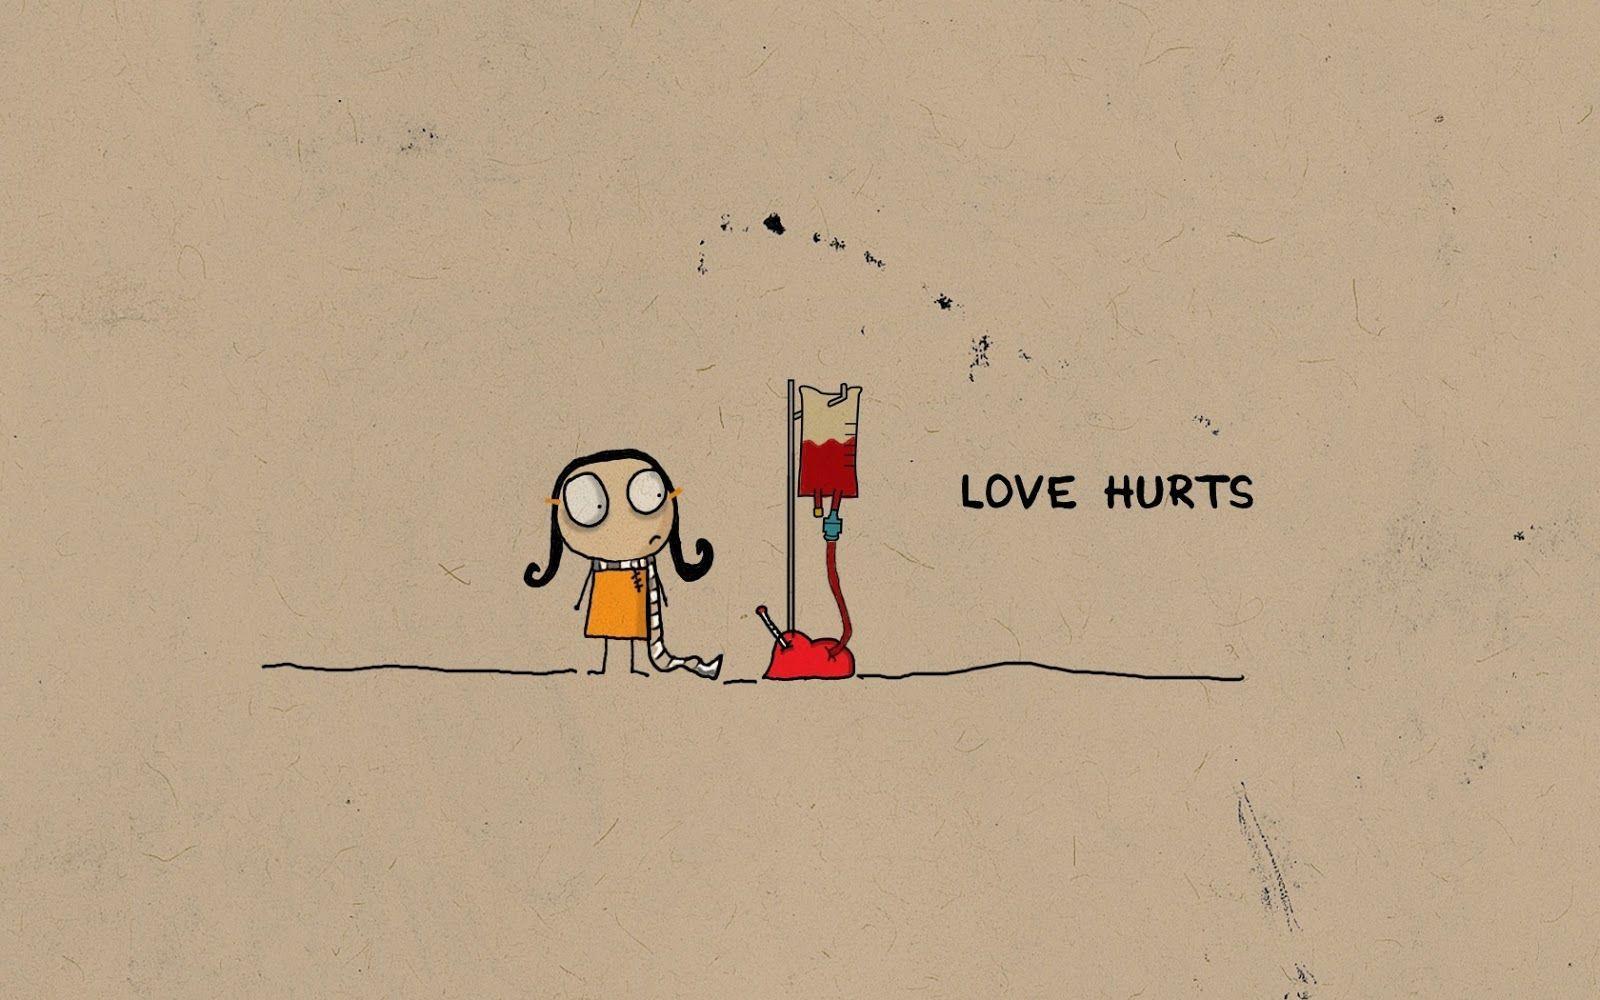 Love failure wallpapers wallpaper cave - Y love hurt wallpaper ...